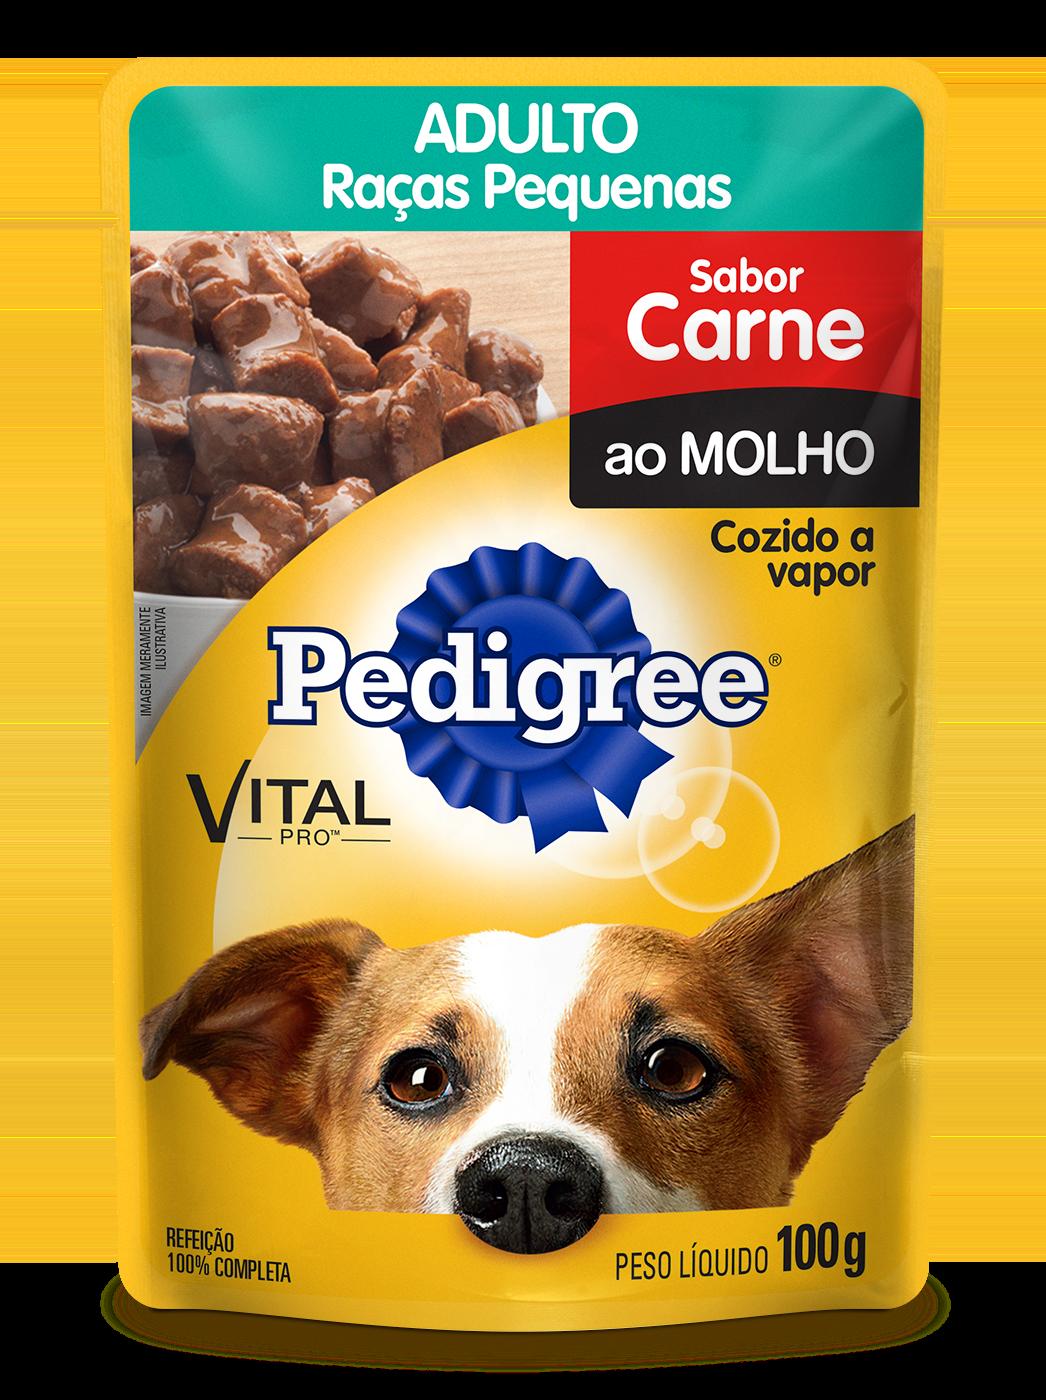 PEDIGREE-SACHE-ADULTO-RP-MOLHO-CARNE-100g-PIXAR-1